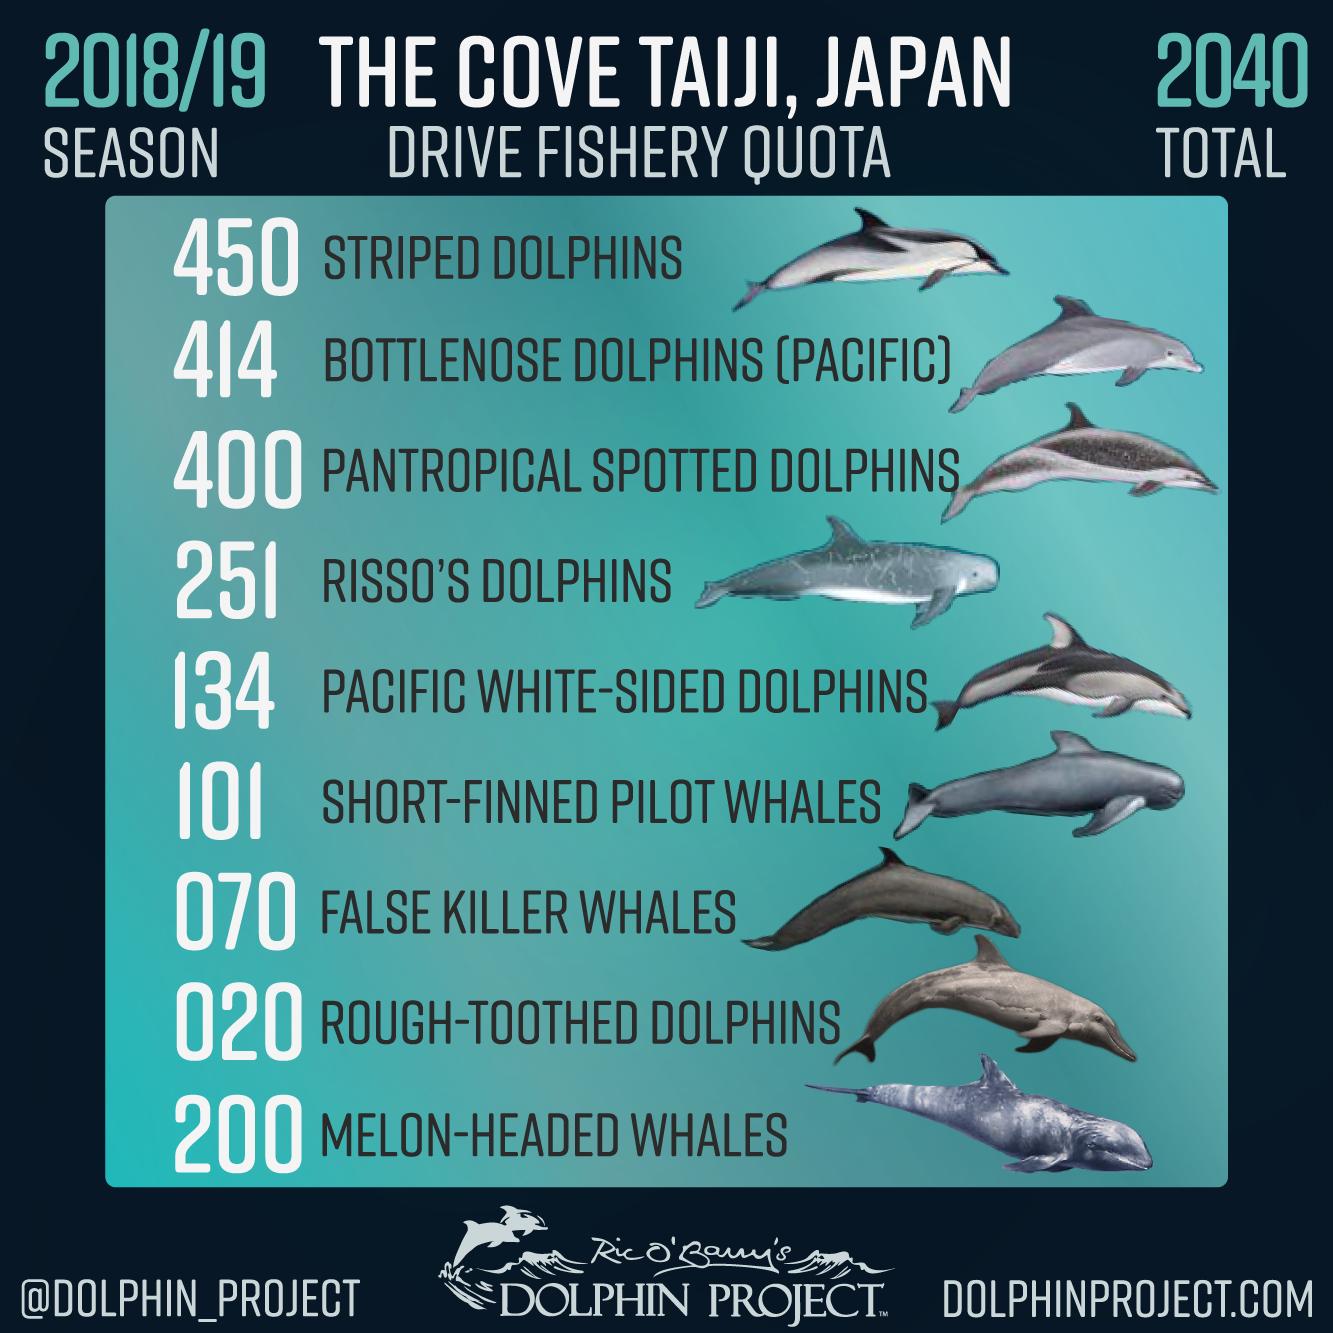 2018 19 Taiji Drive Hunt Season Quota Cove Japan